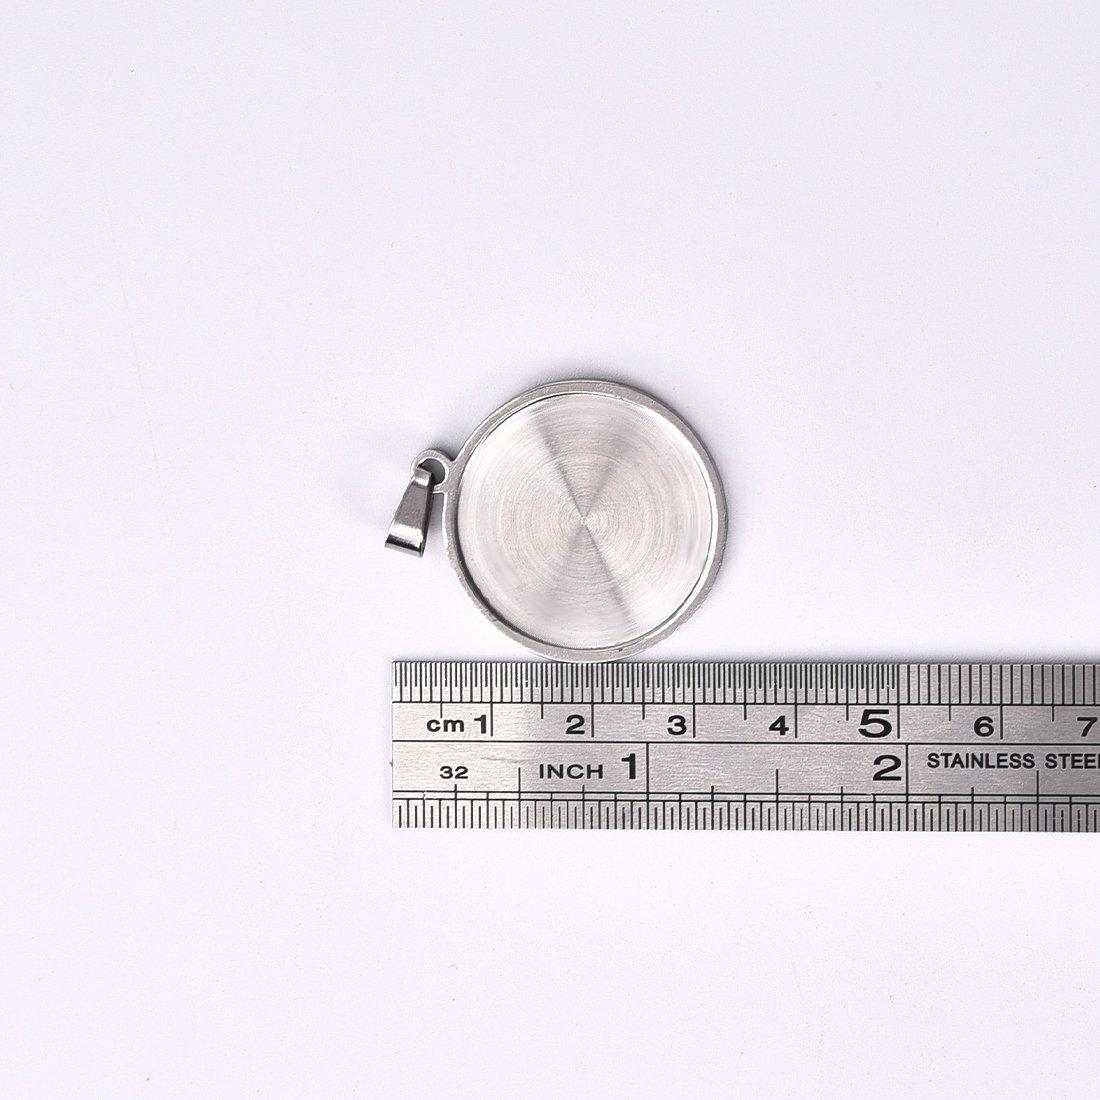 Stainless Steel Bezel Pendant Trays Round Cabochon Settings Trays Pendant Blanks 12X12mm 50PCS